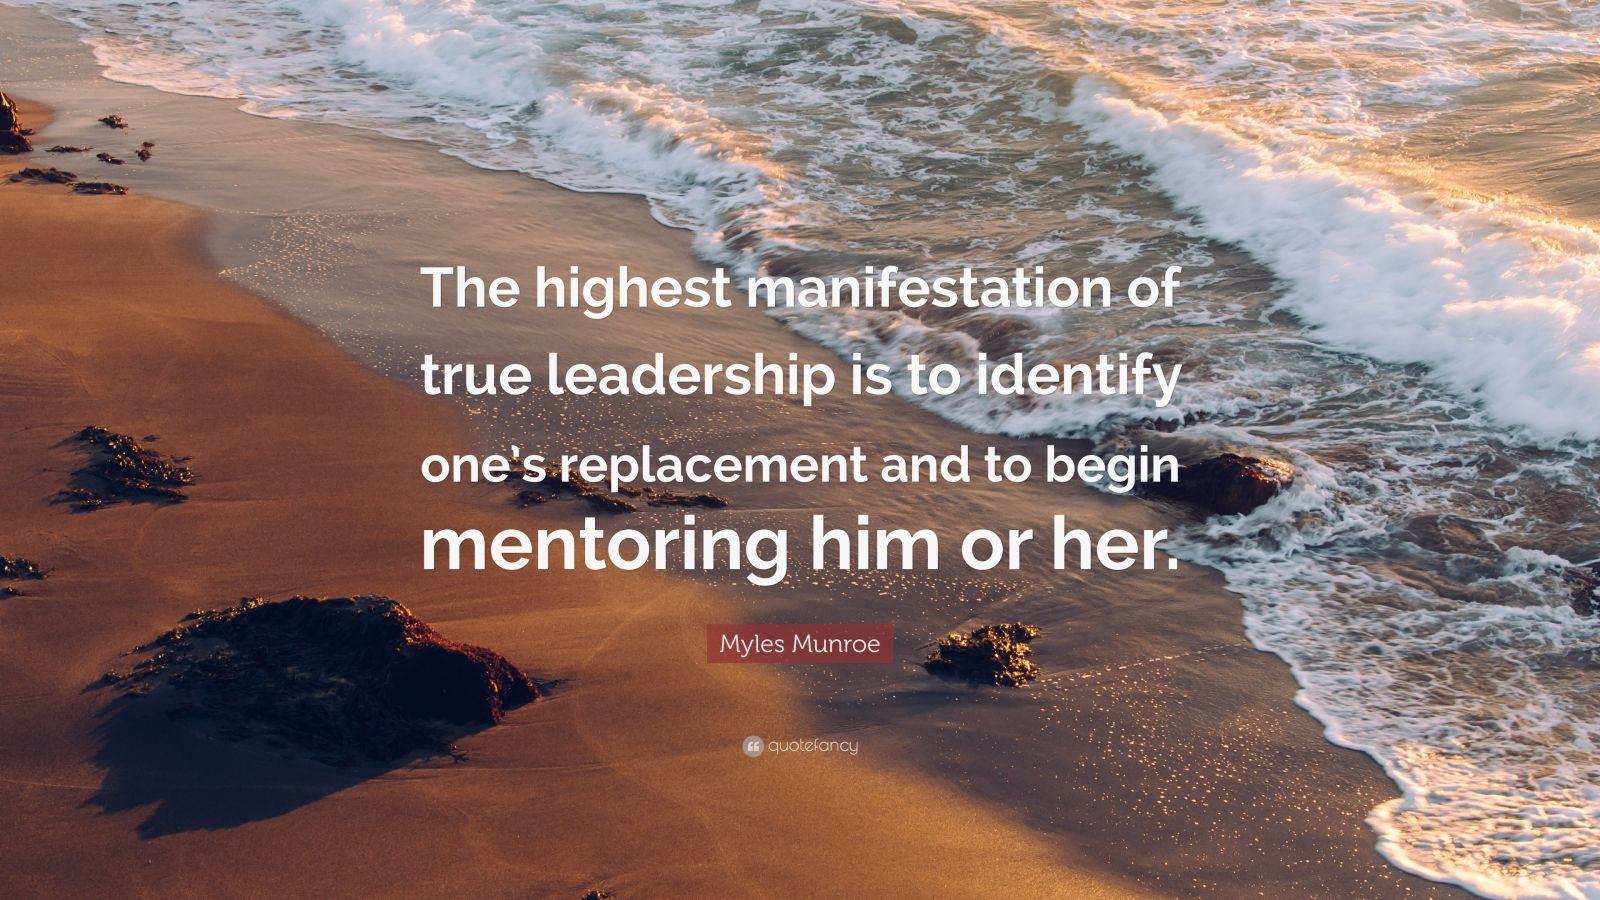 Myles Munroe Quote: The highest manifestation of true